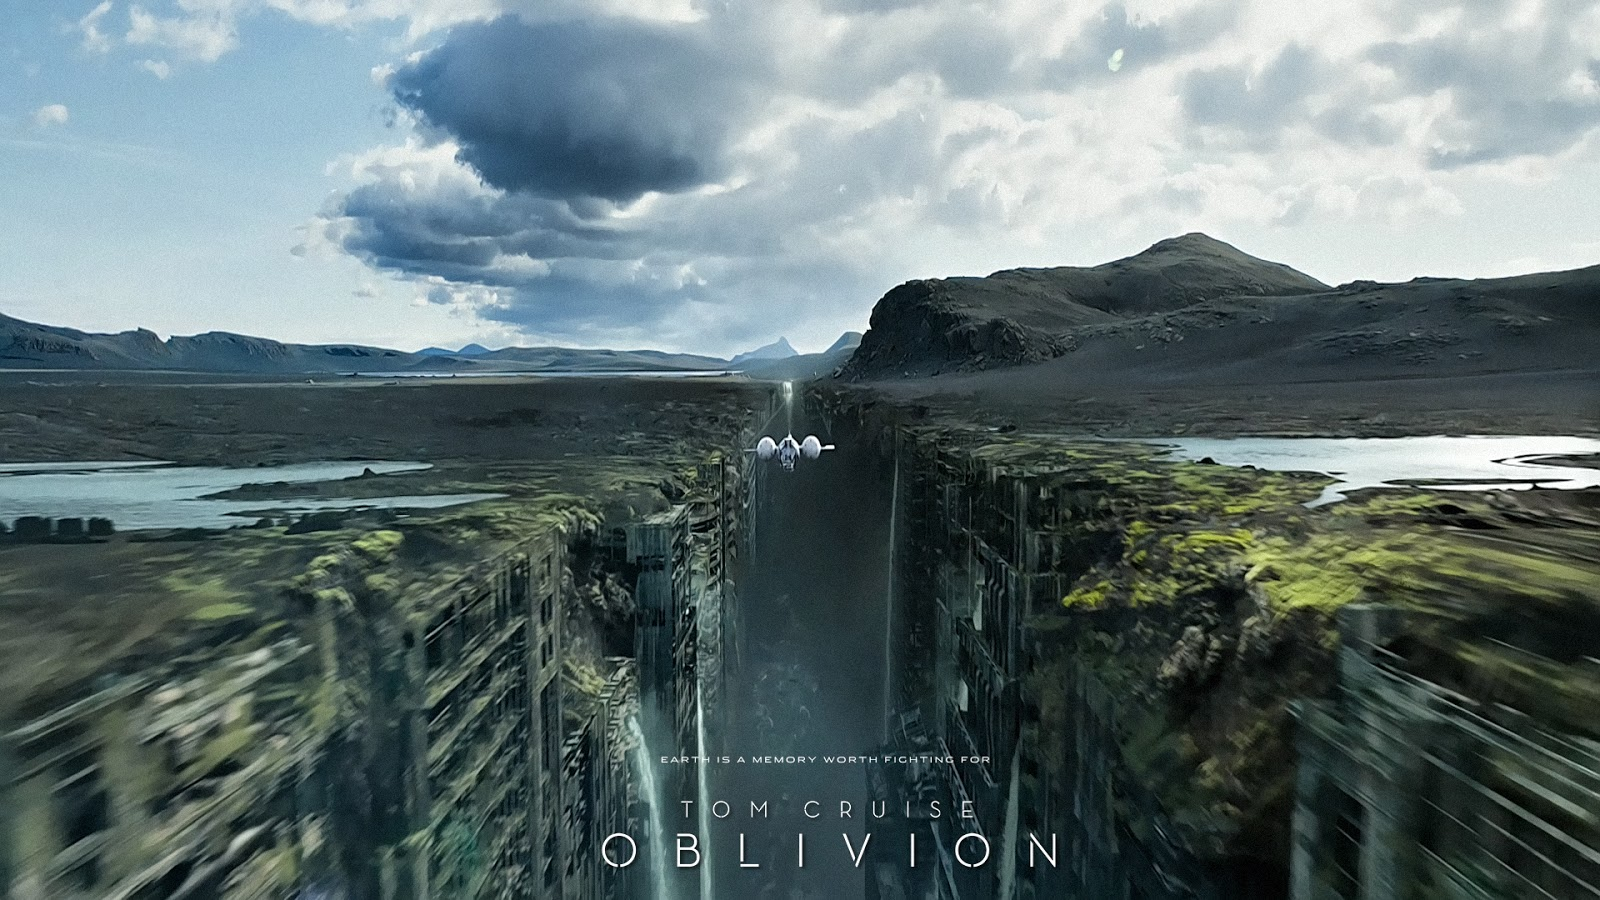 Dead Rising 3 Wallpaper Hd Movie Review Oblivion 2013 Nerdspan